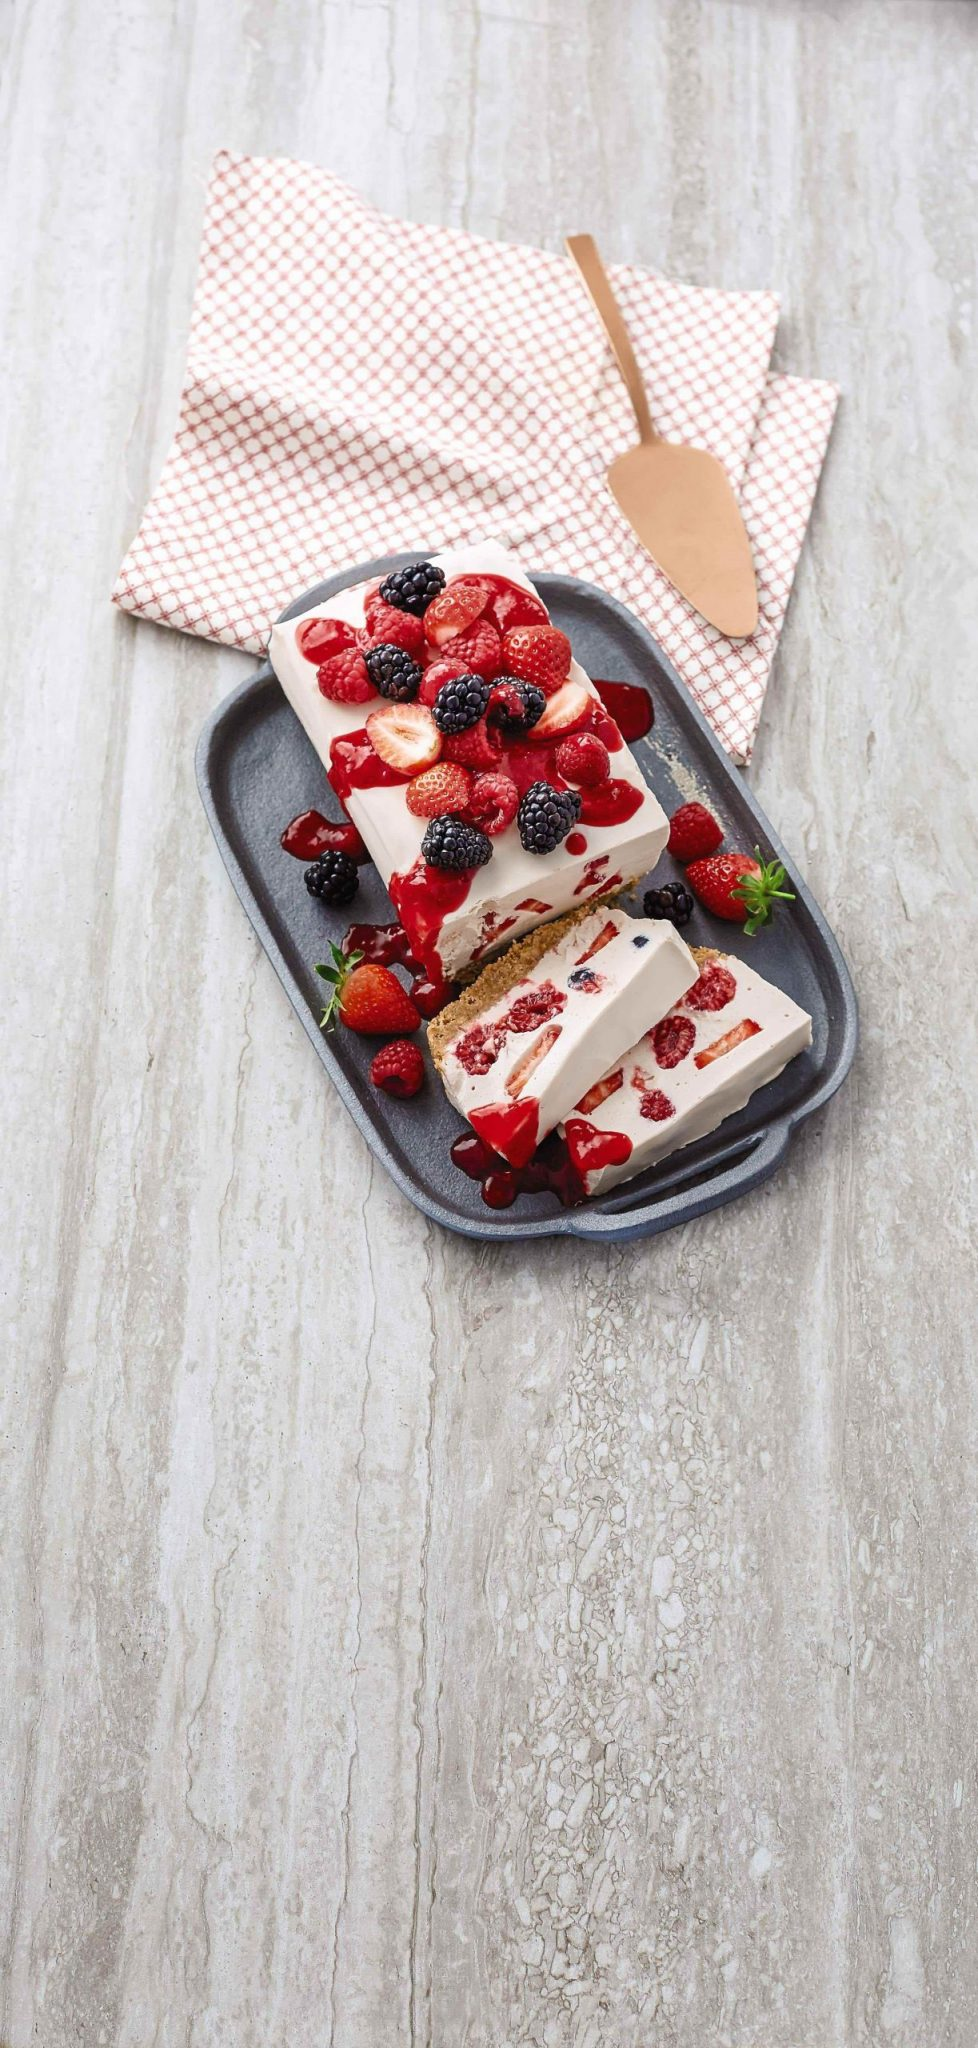 Aldi's Summer Berry Cheesecake